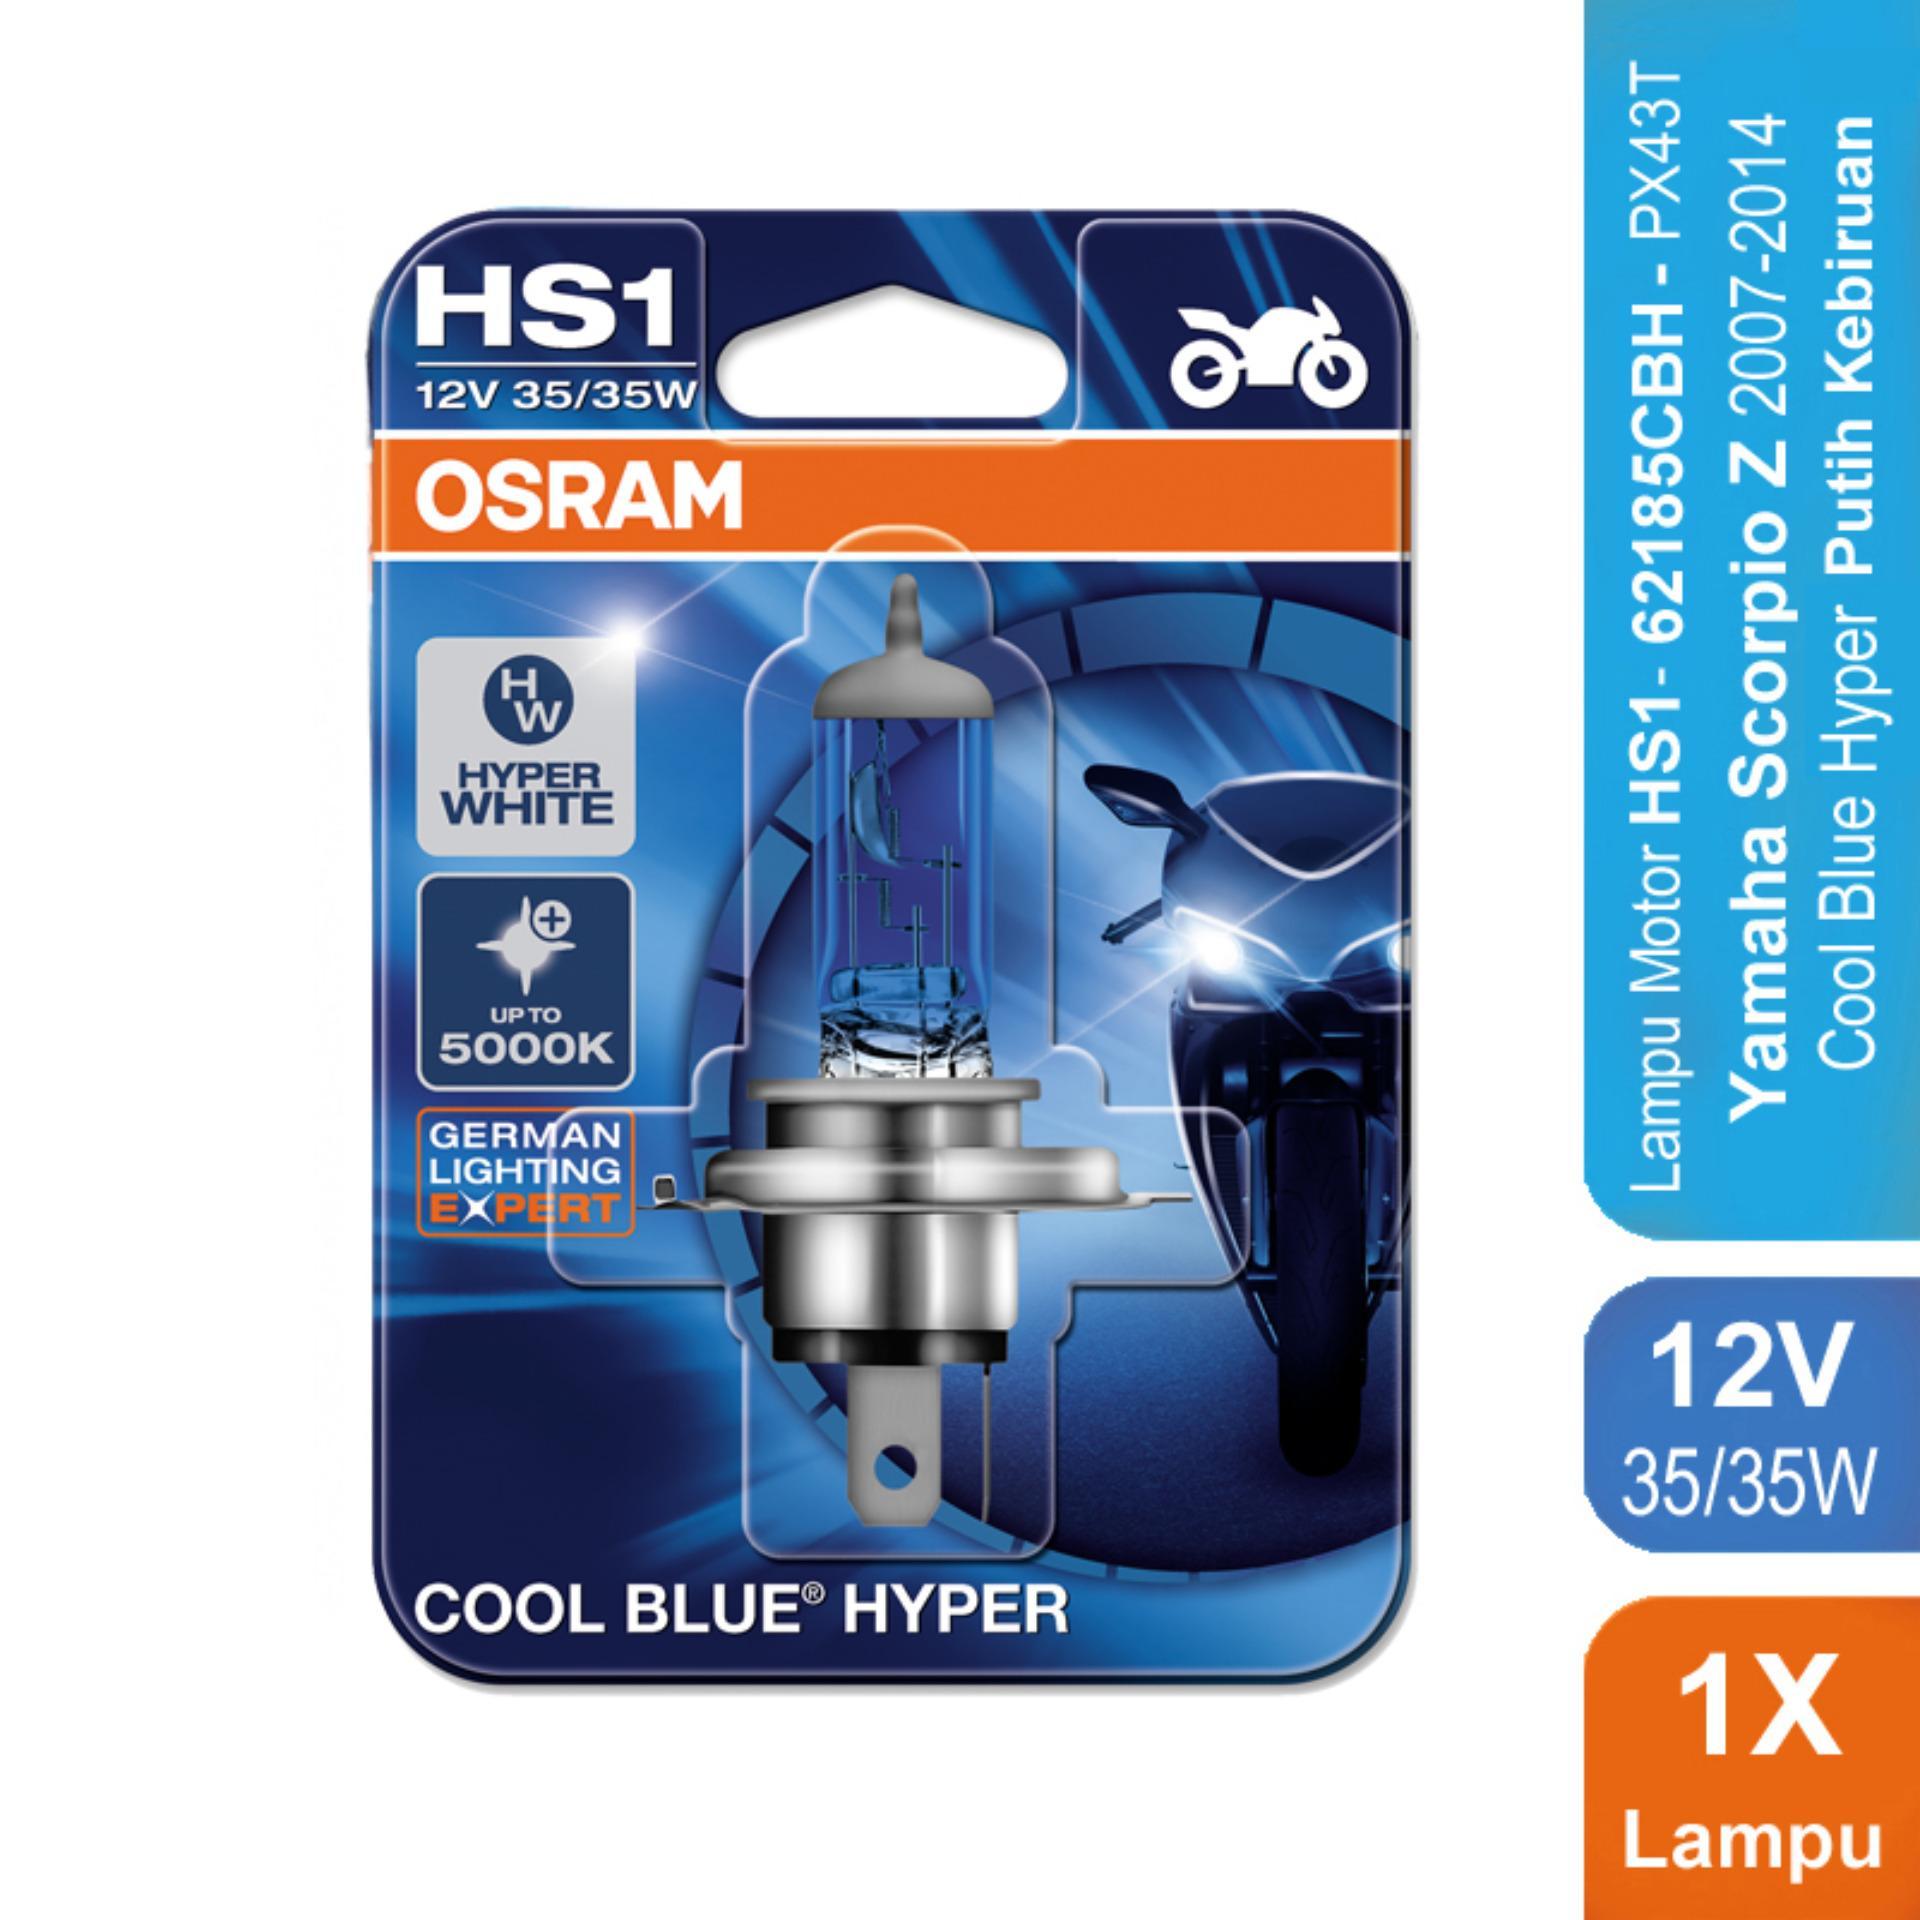 Osram Lampu Motor Yamaha Scorpio Z 2007-2014 - HS1 62185CBH 12V 35/35 - Cool Blue Hyper